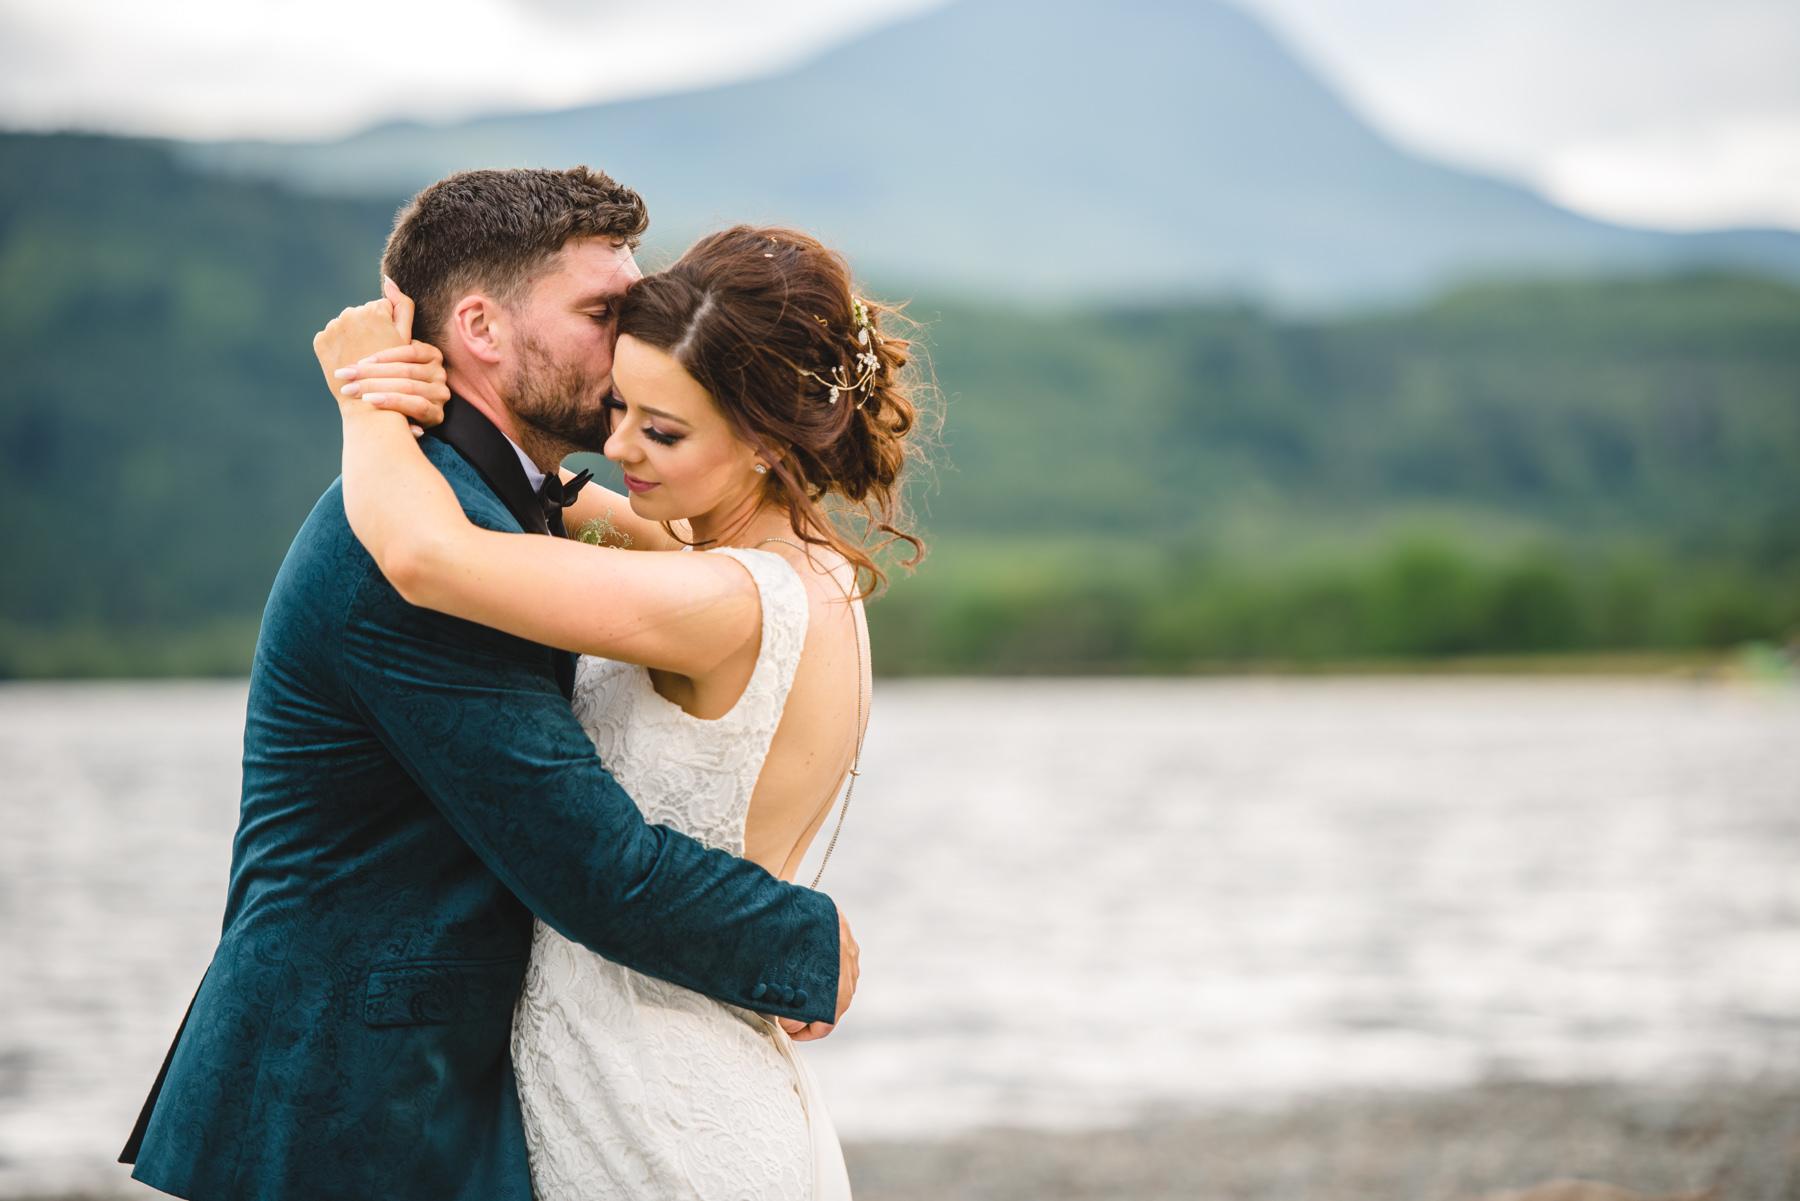 Ben Lomond wedding portraits